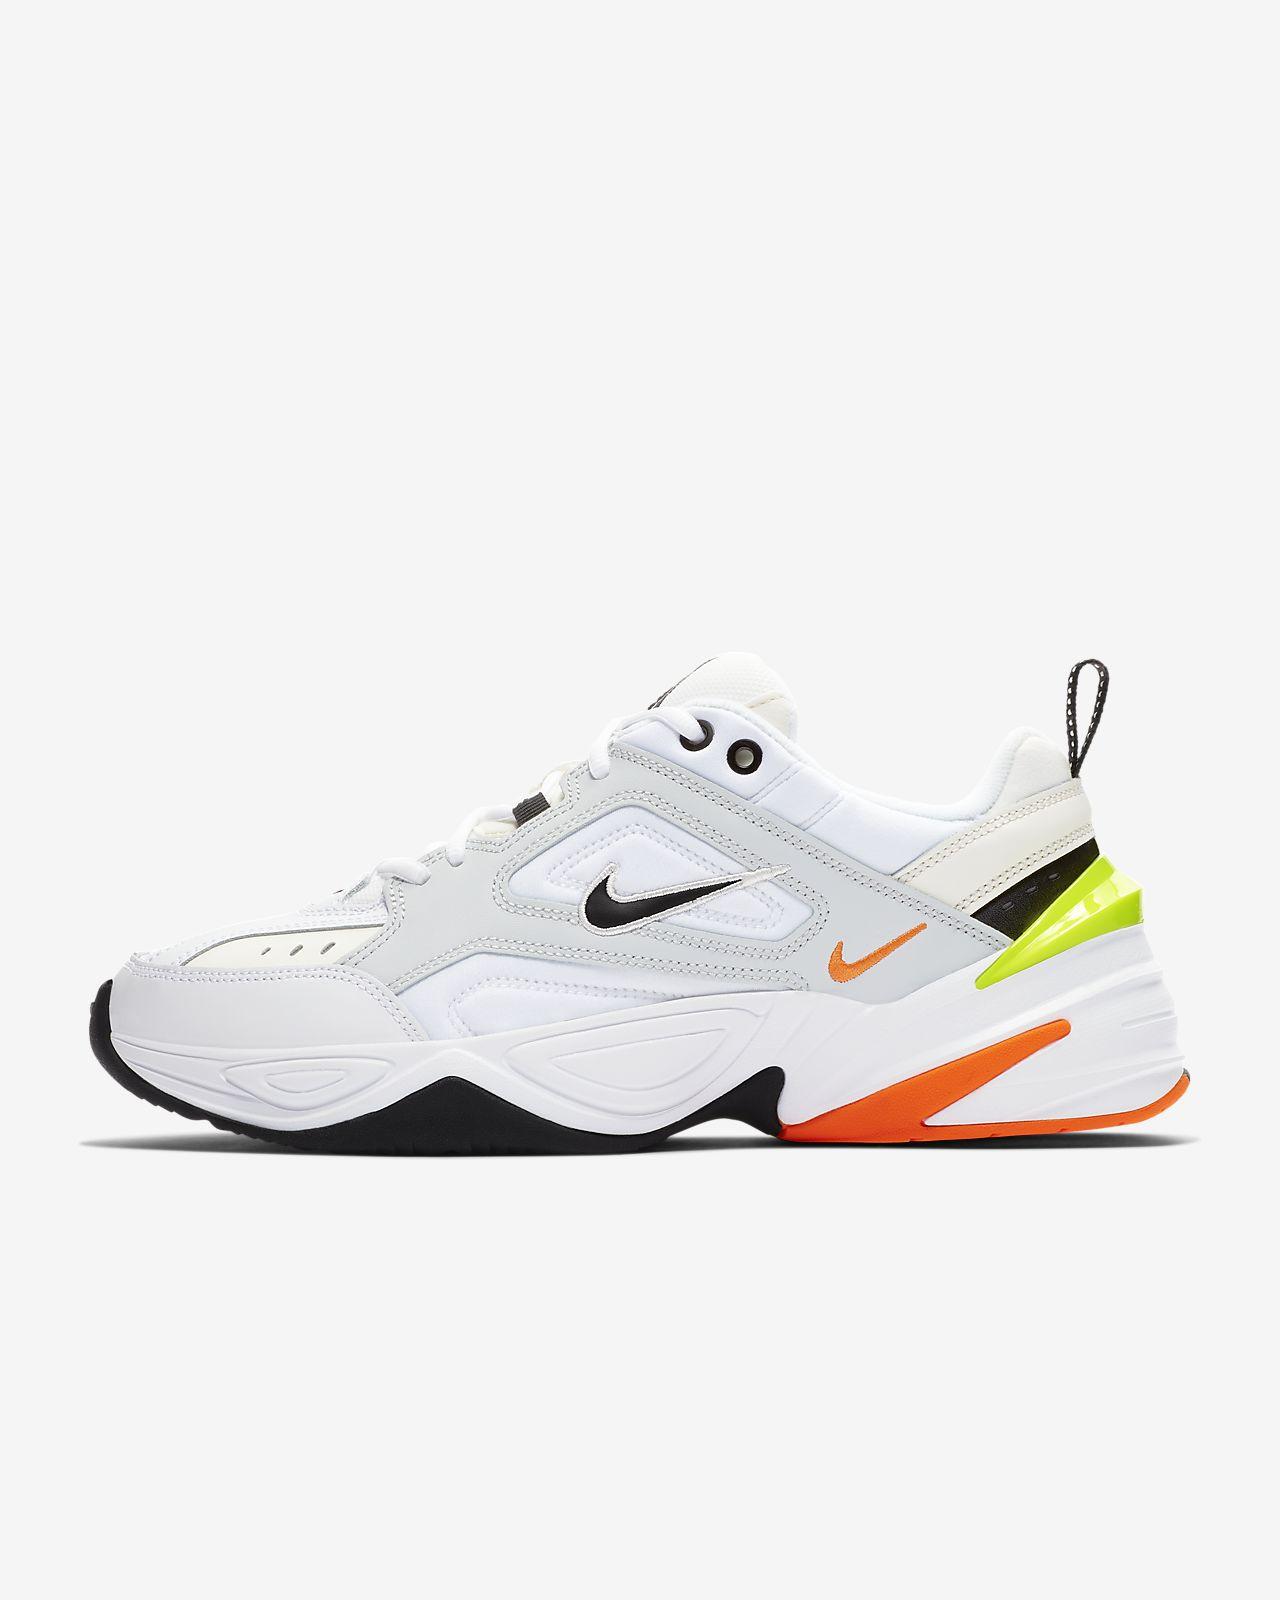 38dddcef1e9ba Scarpa Nike M2K Tekno - Uomo. Nike.com IT